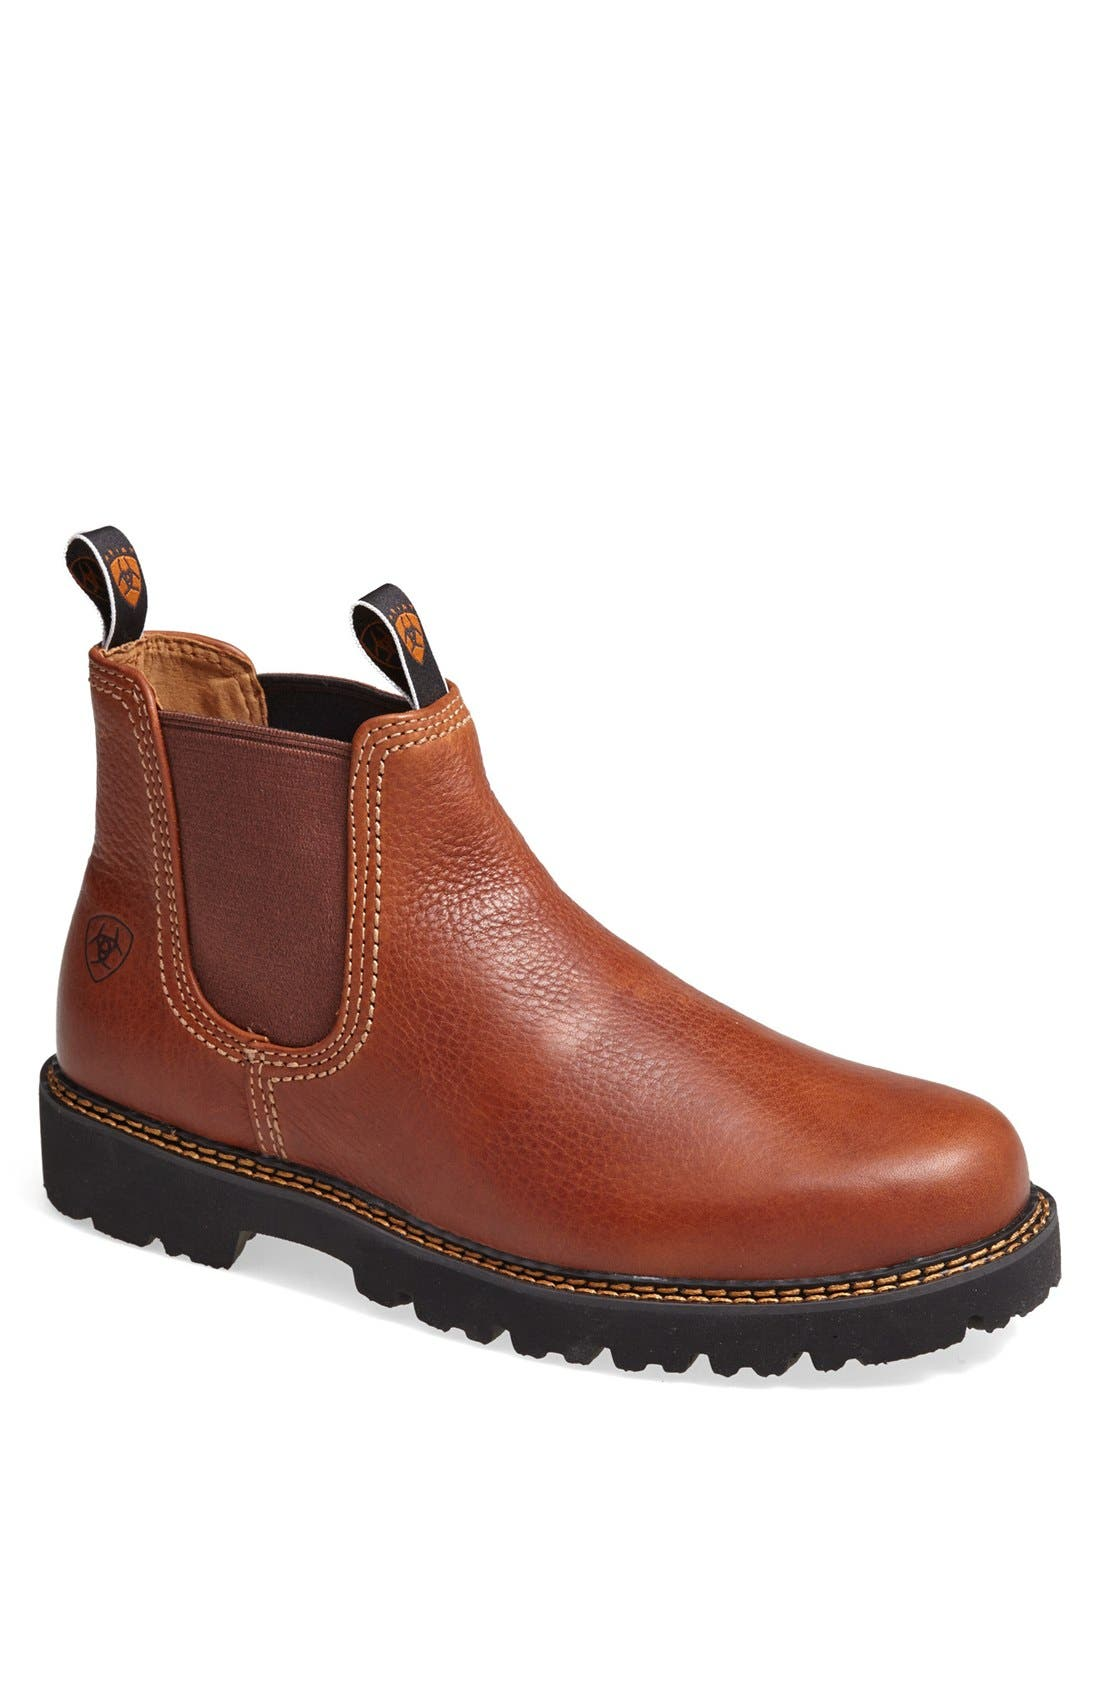 ARIAT 'Spot Hog' Chelsea Boot, Main, color, PEANUT